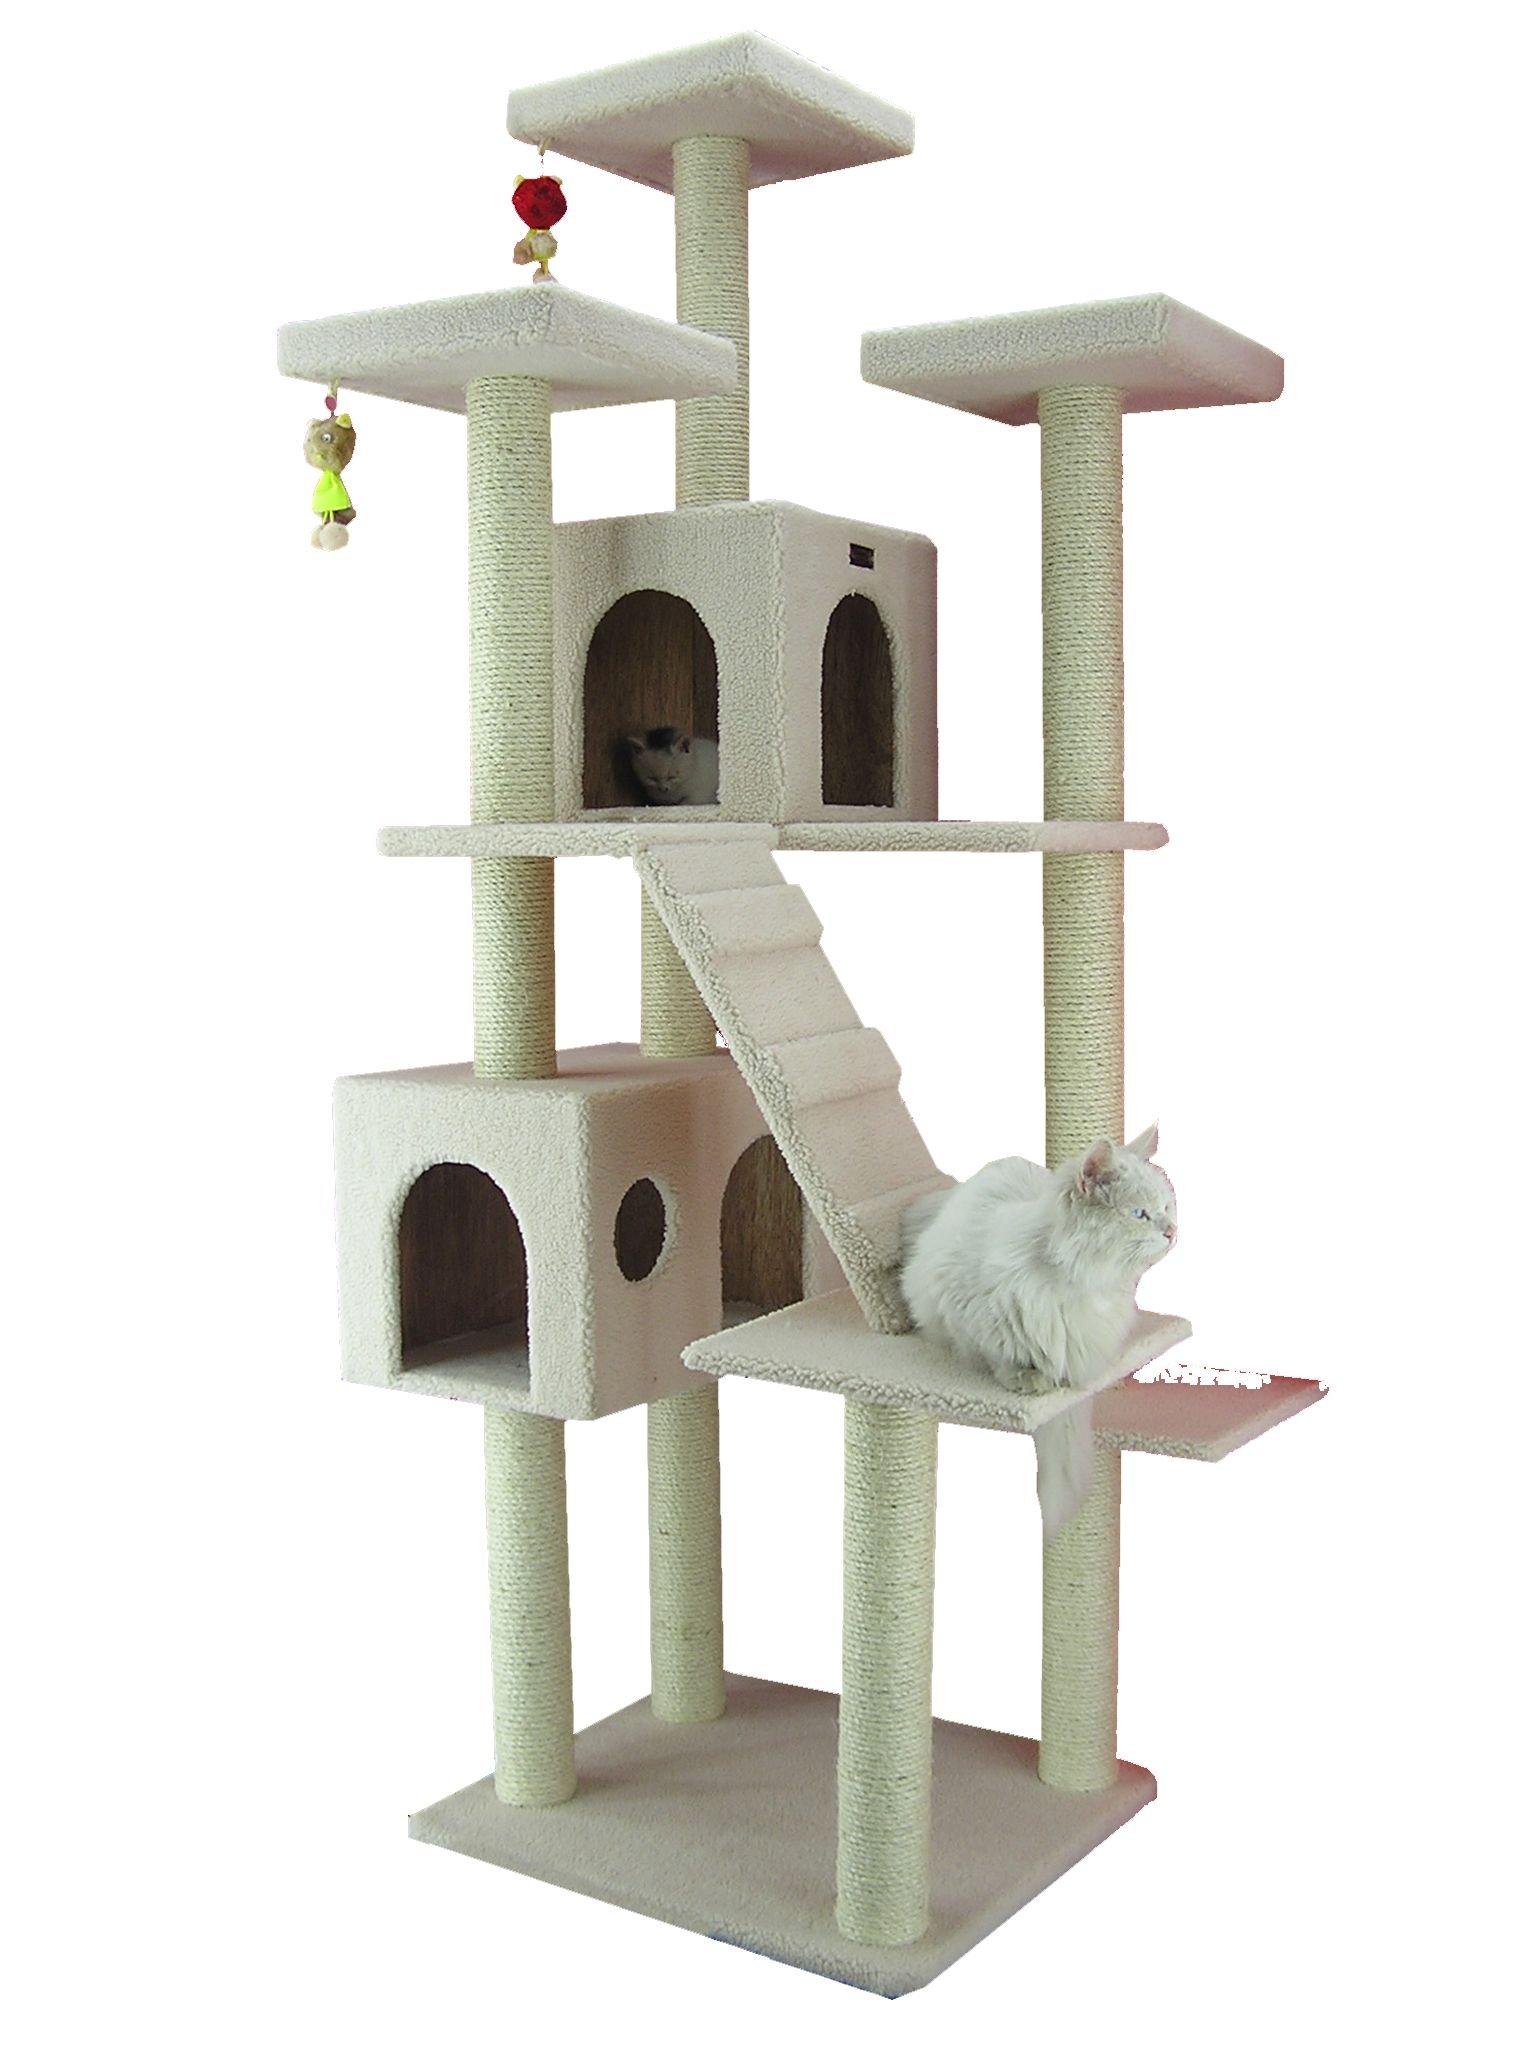 Armarkat Cat Tree Model B7701, Ivory